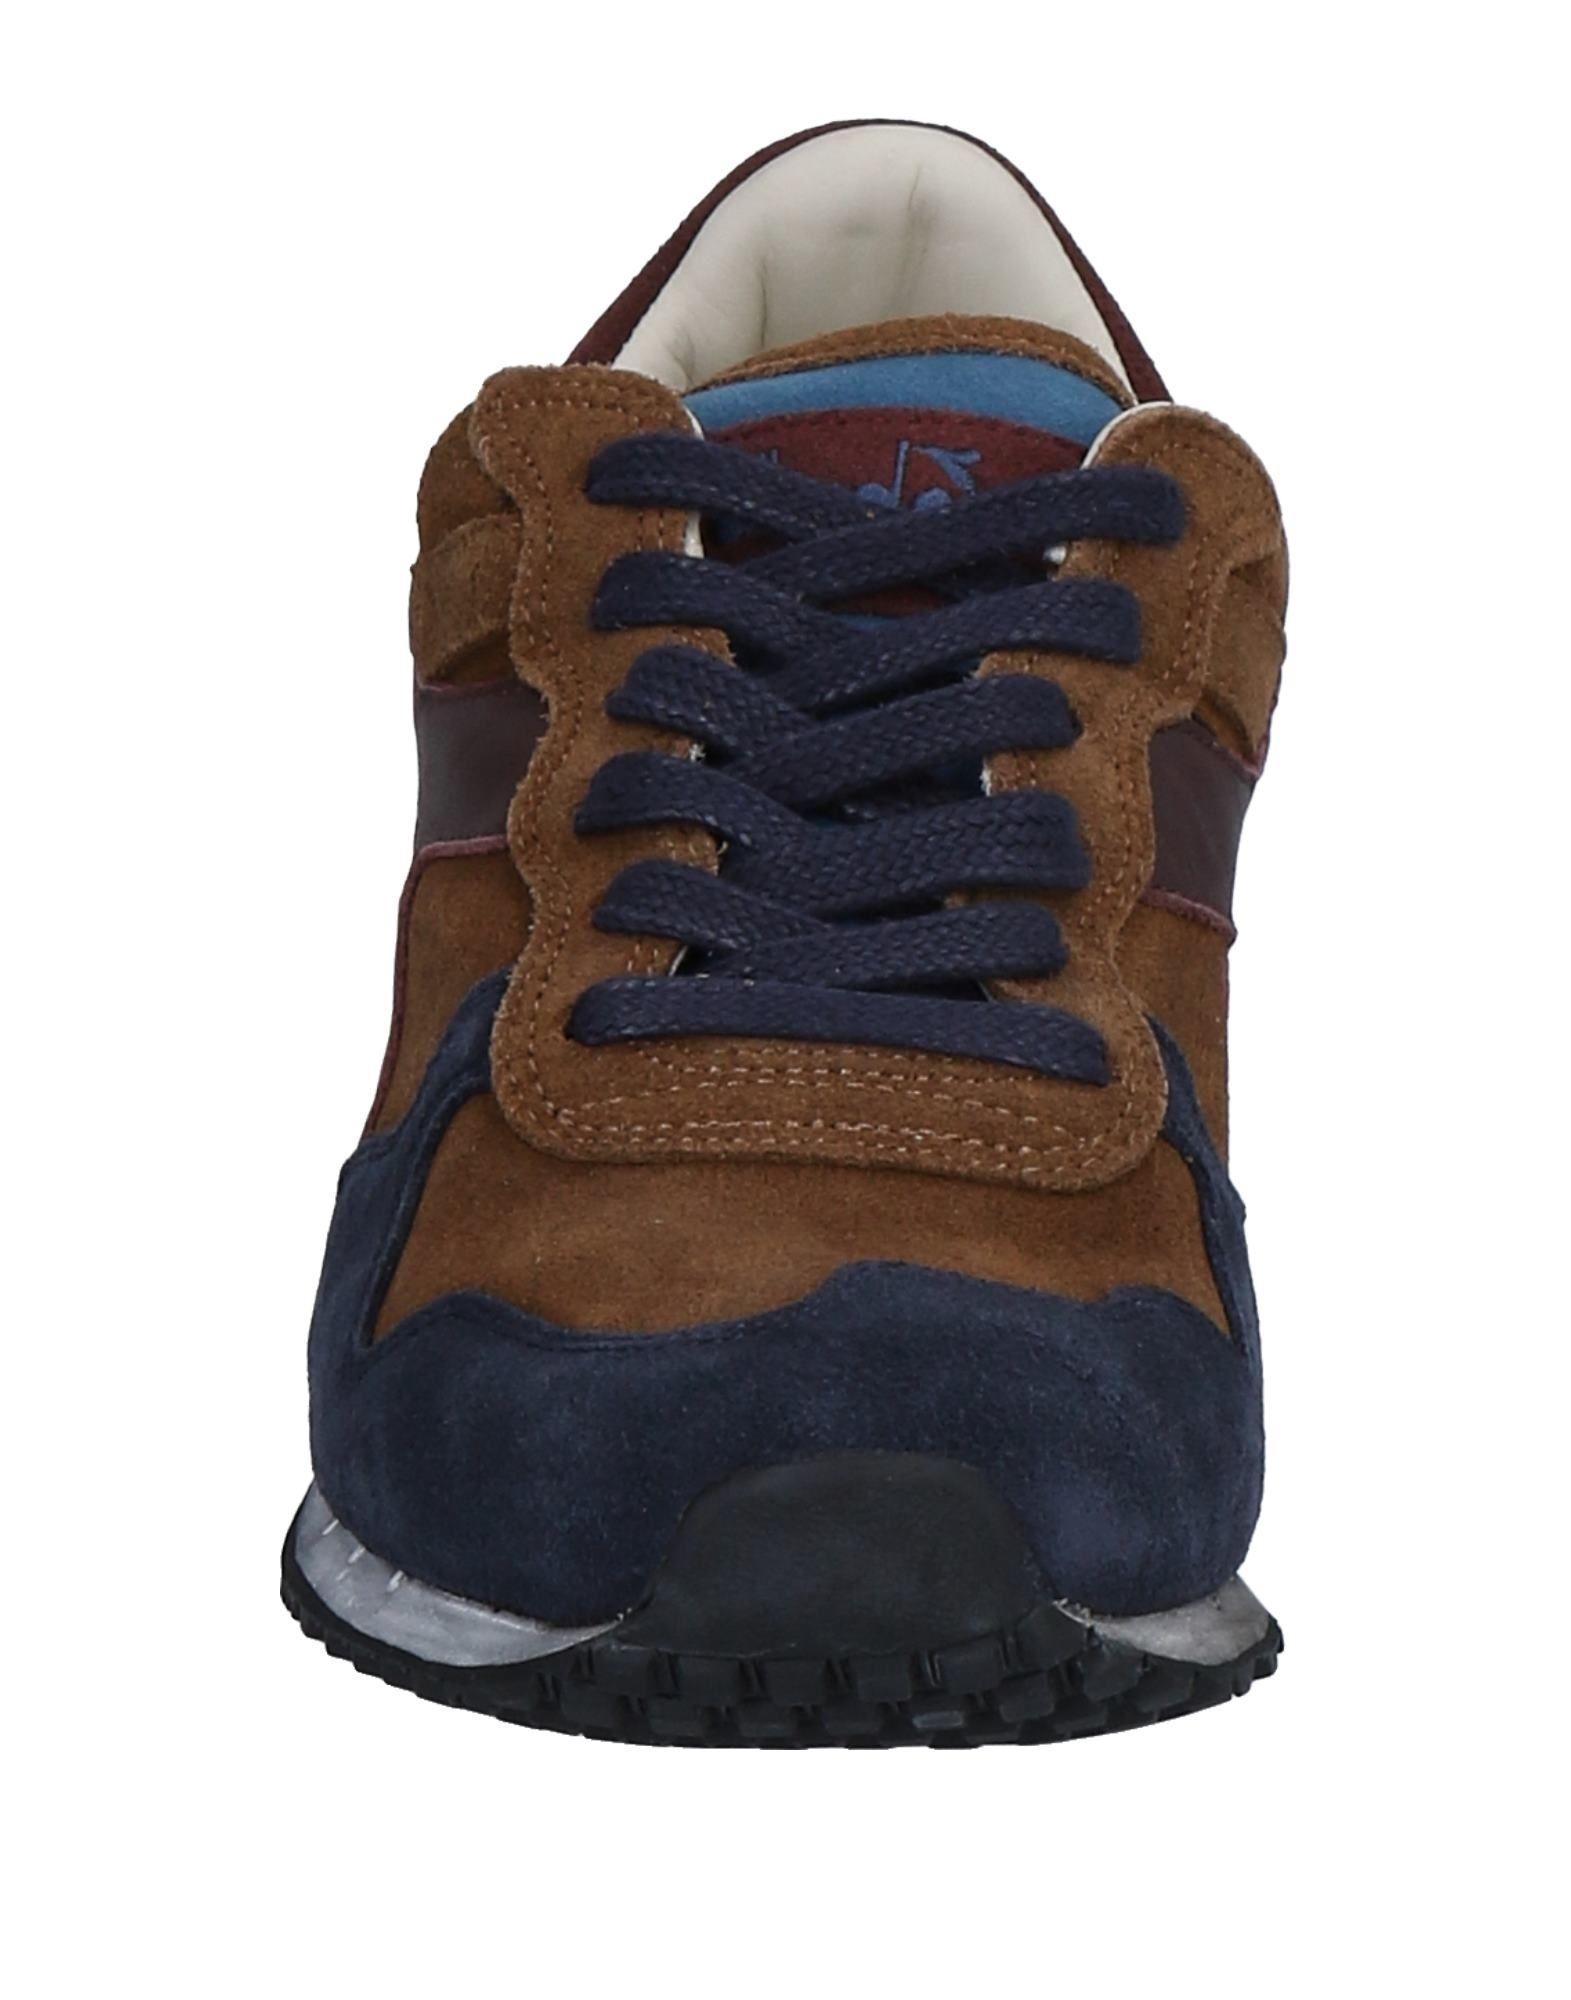 Diadora Heritage Sneakers Damen    11522702FE Gute Qualität beliebte Schuhe 4827de